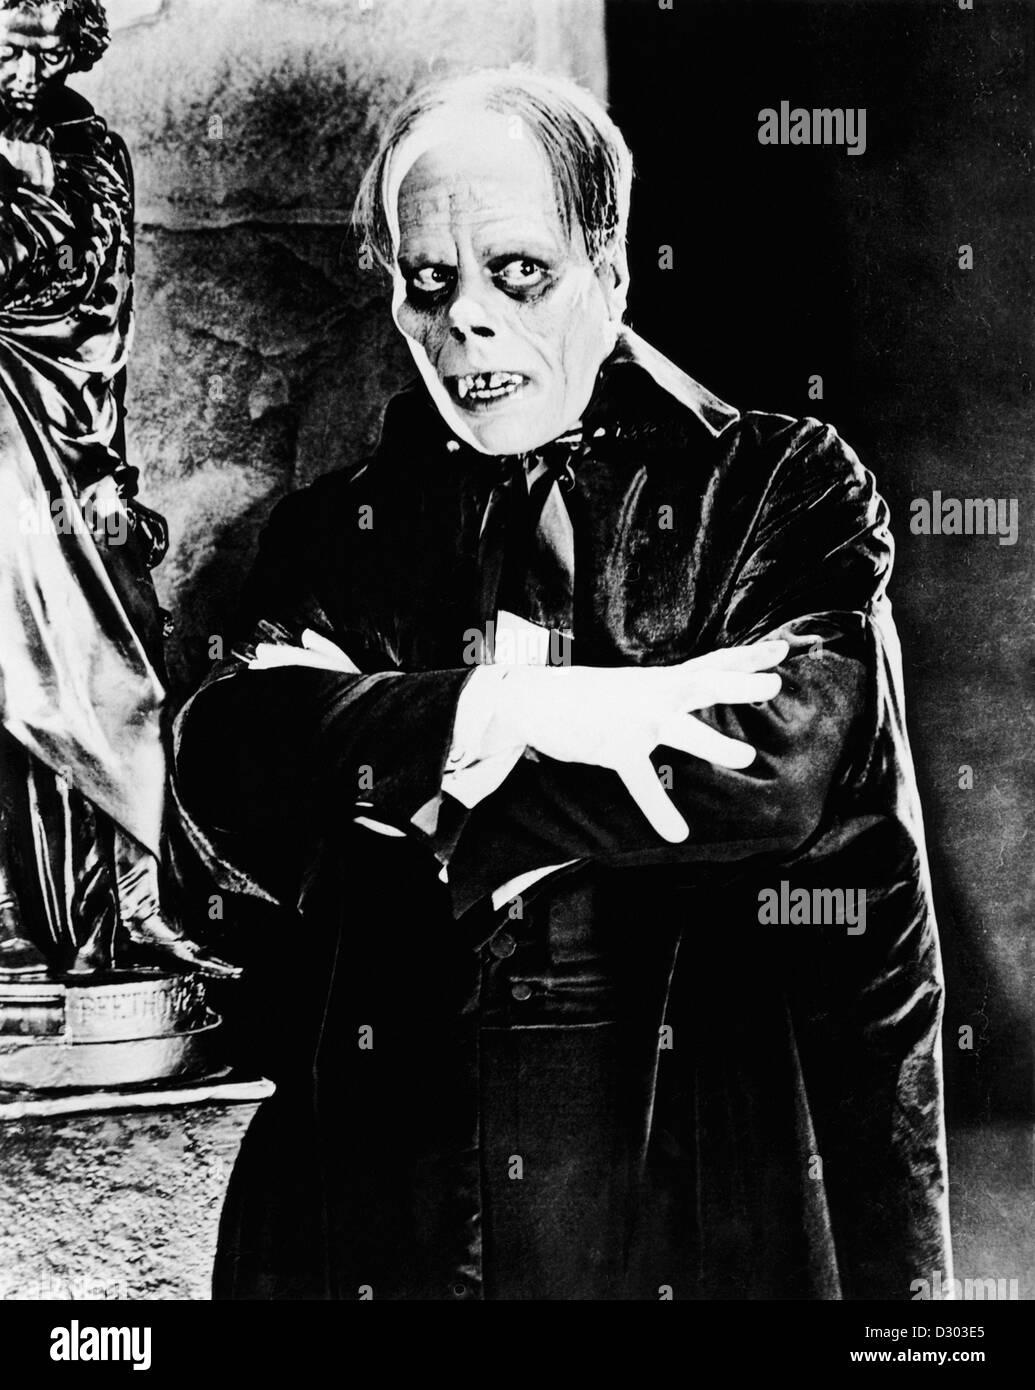 The phantom of the Opera - Stock Image